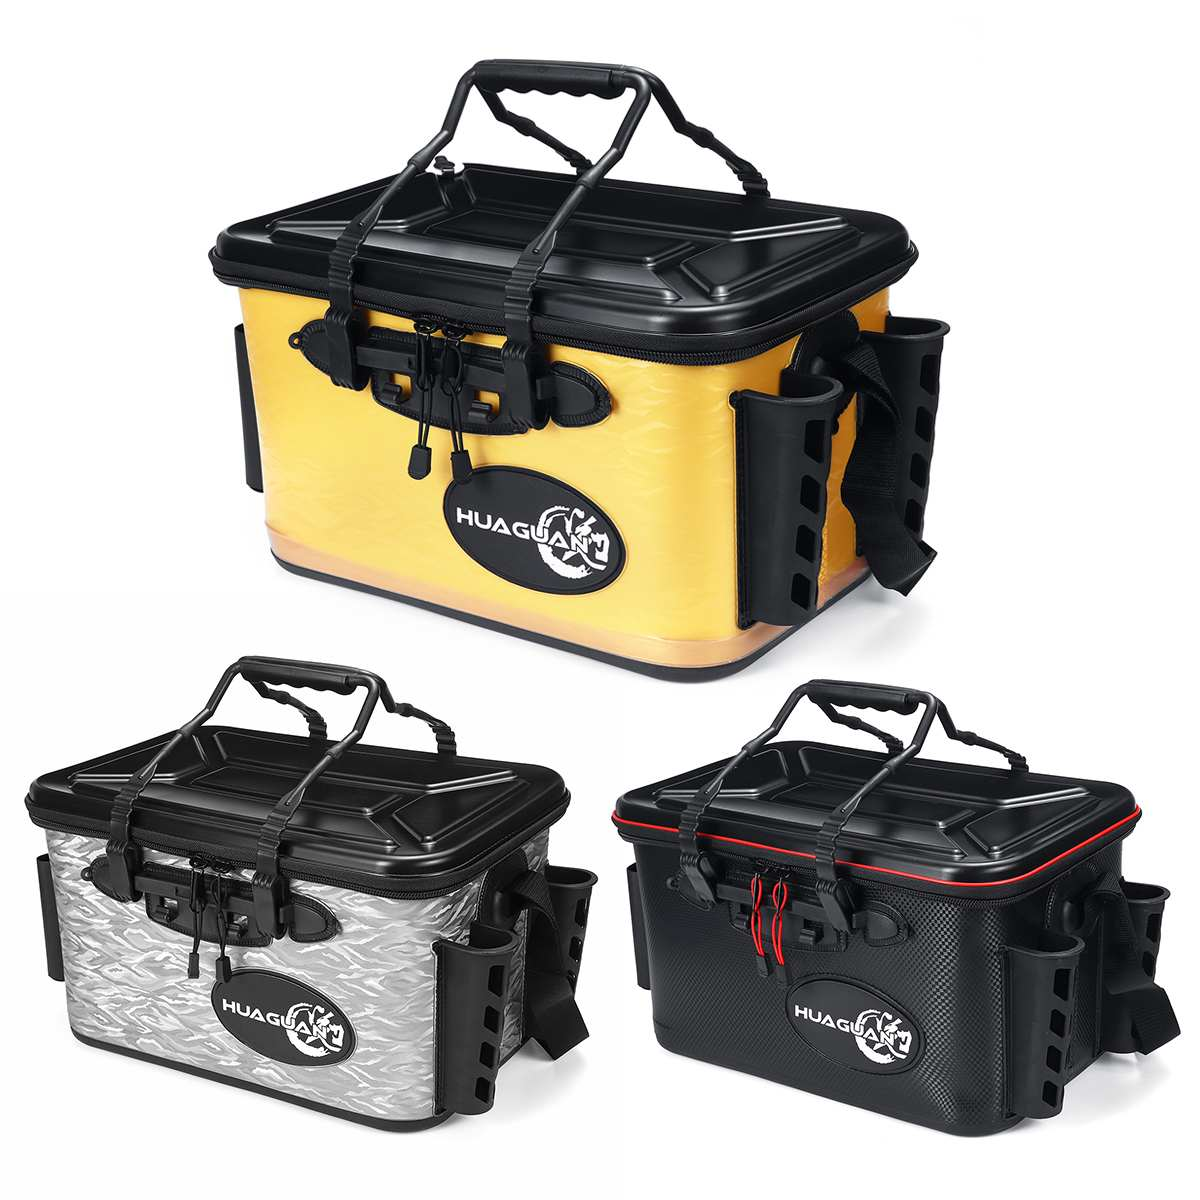 28L Black/Silver/Yellow Fishing Box For Bits In Fishing Tackle Boxes 5V 2600 MAH USB Plastic Multi-function Portable Fishing Box